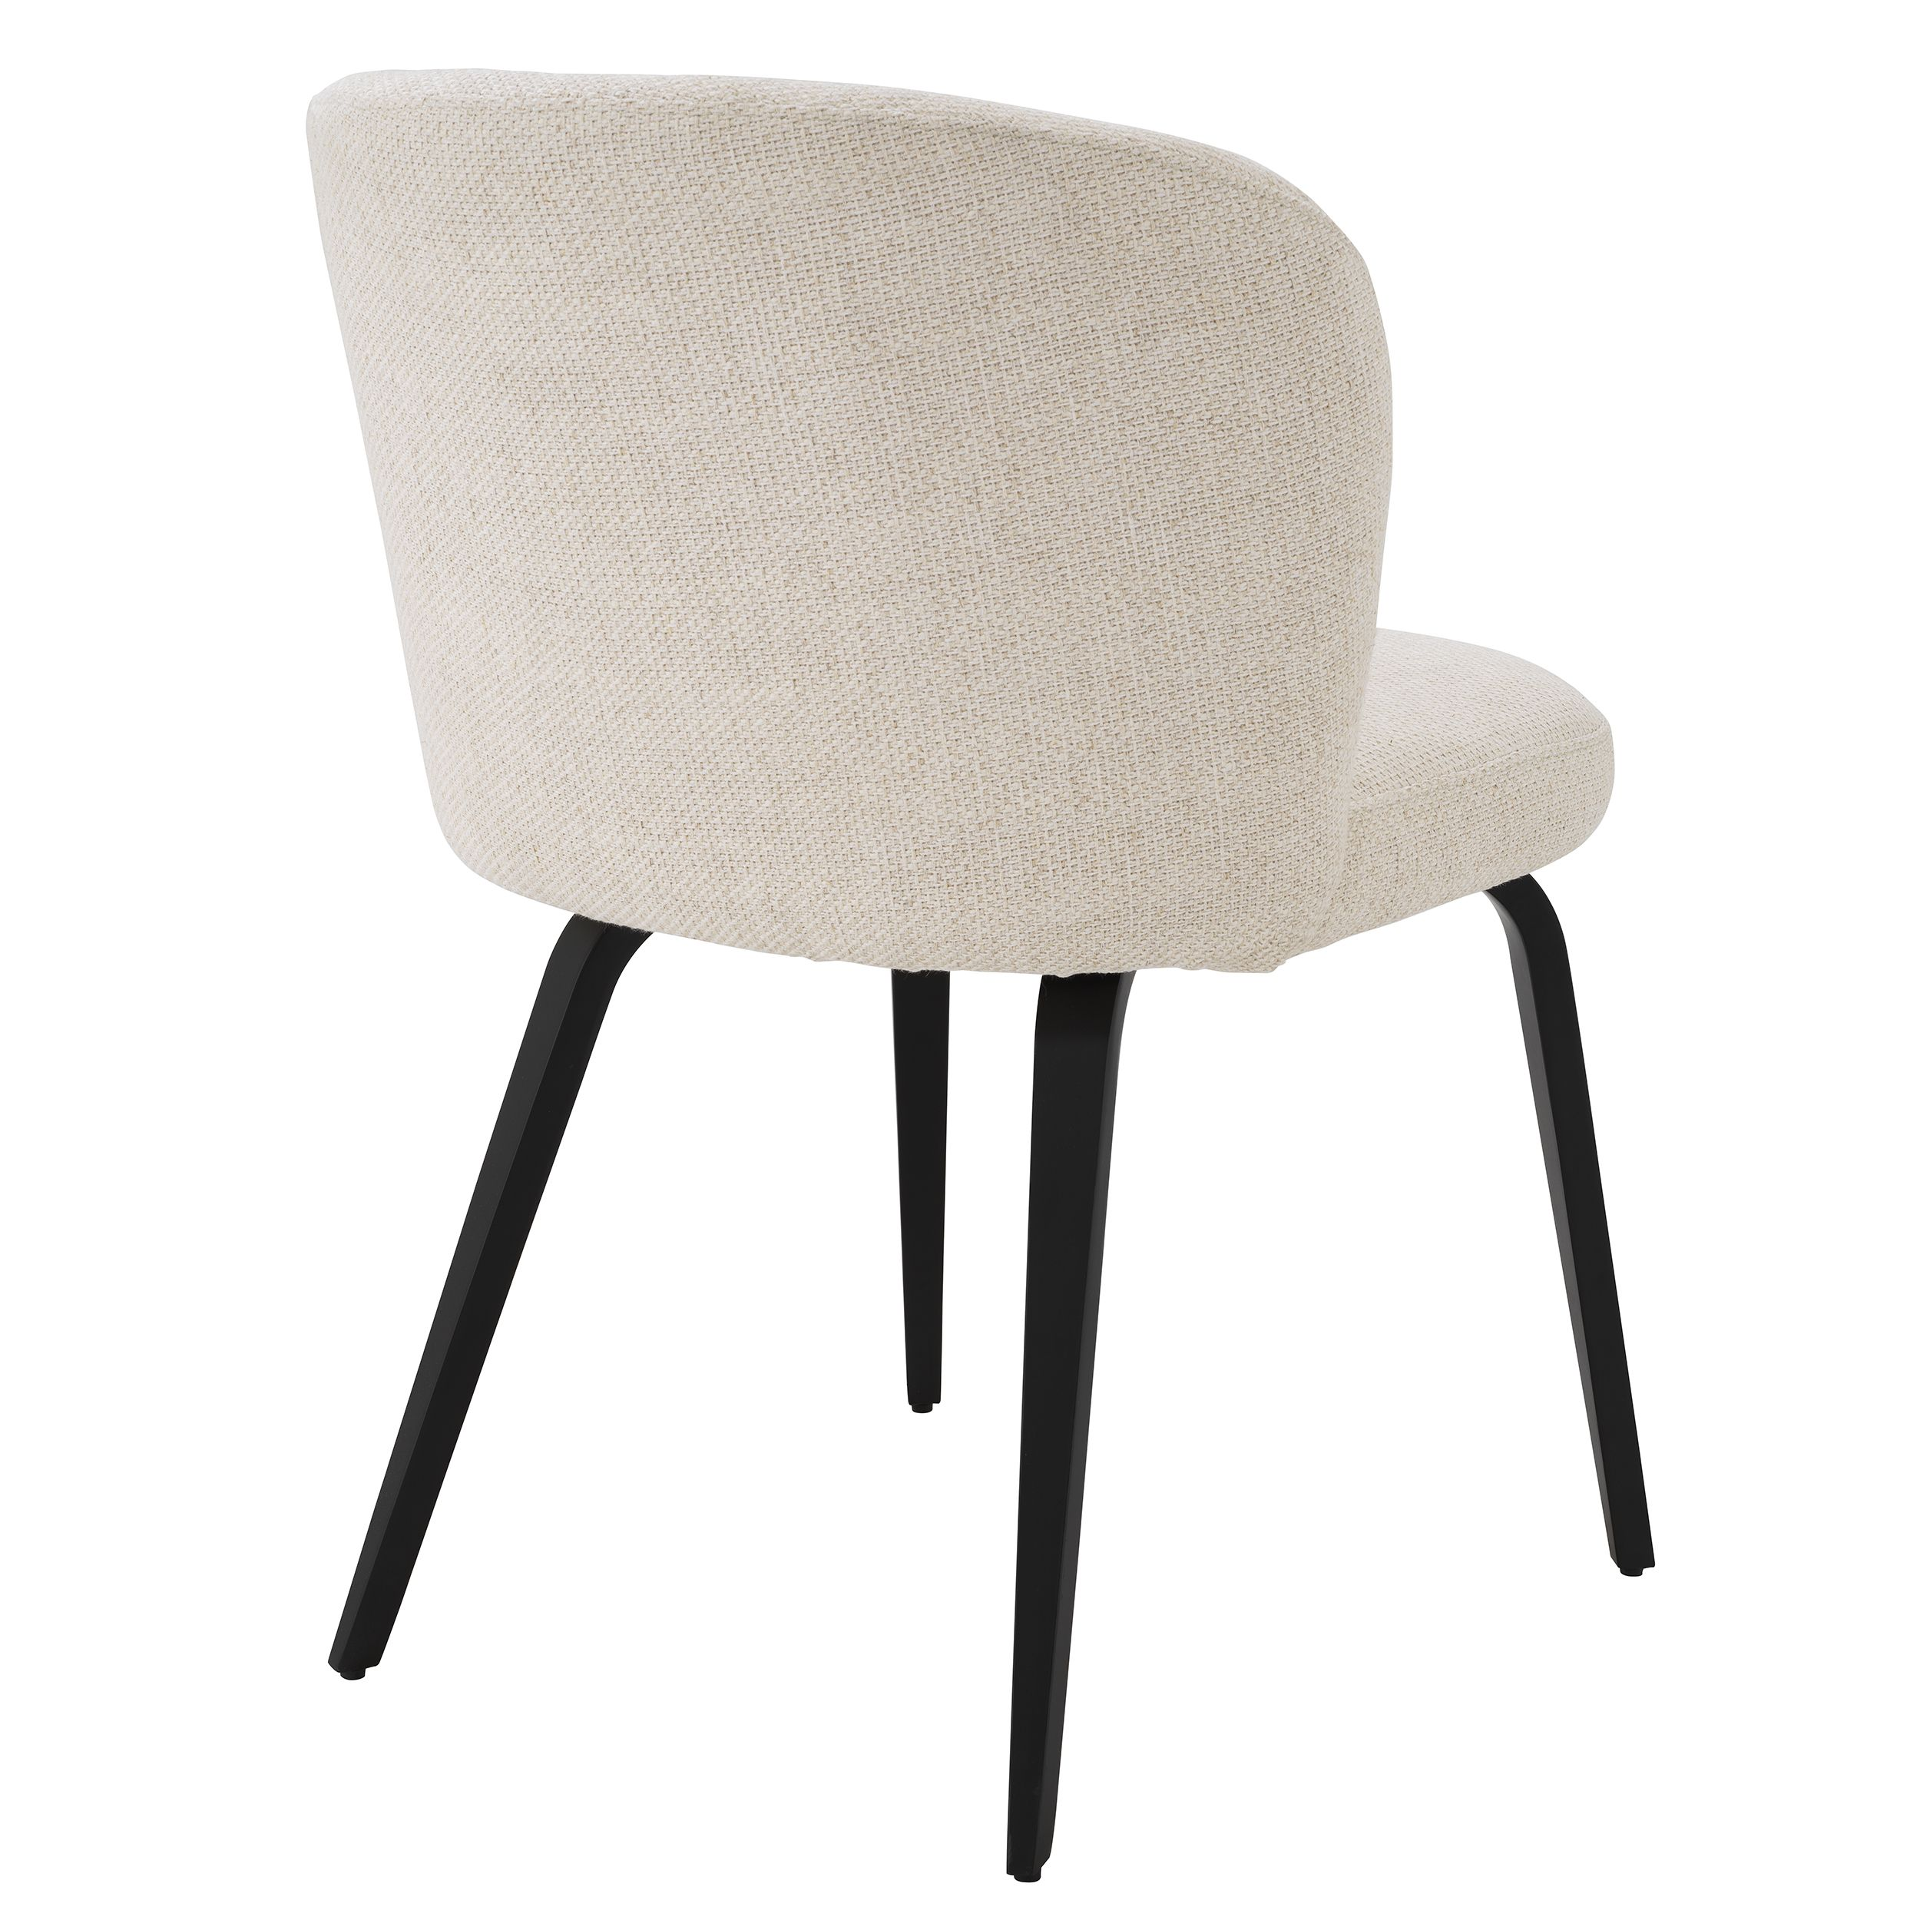 Eichholtz-chair-harald-4